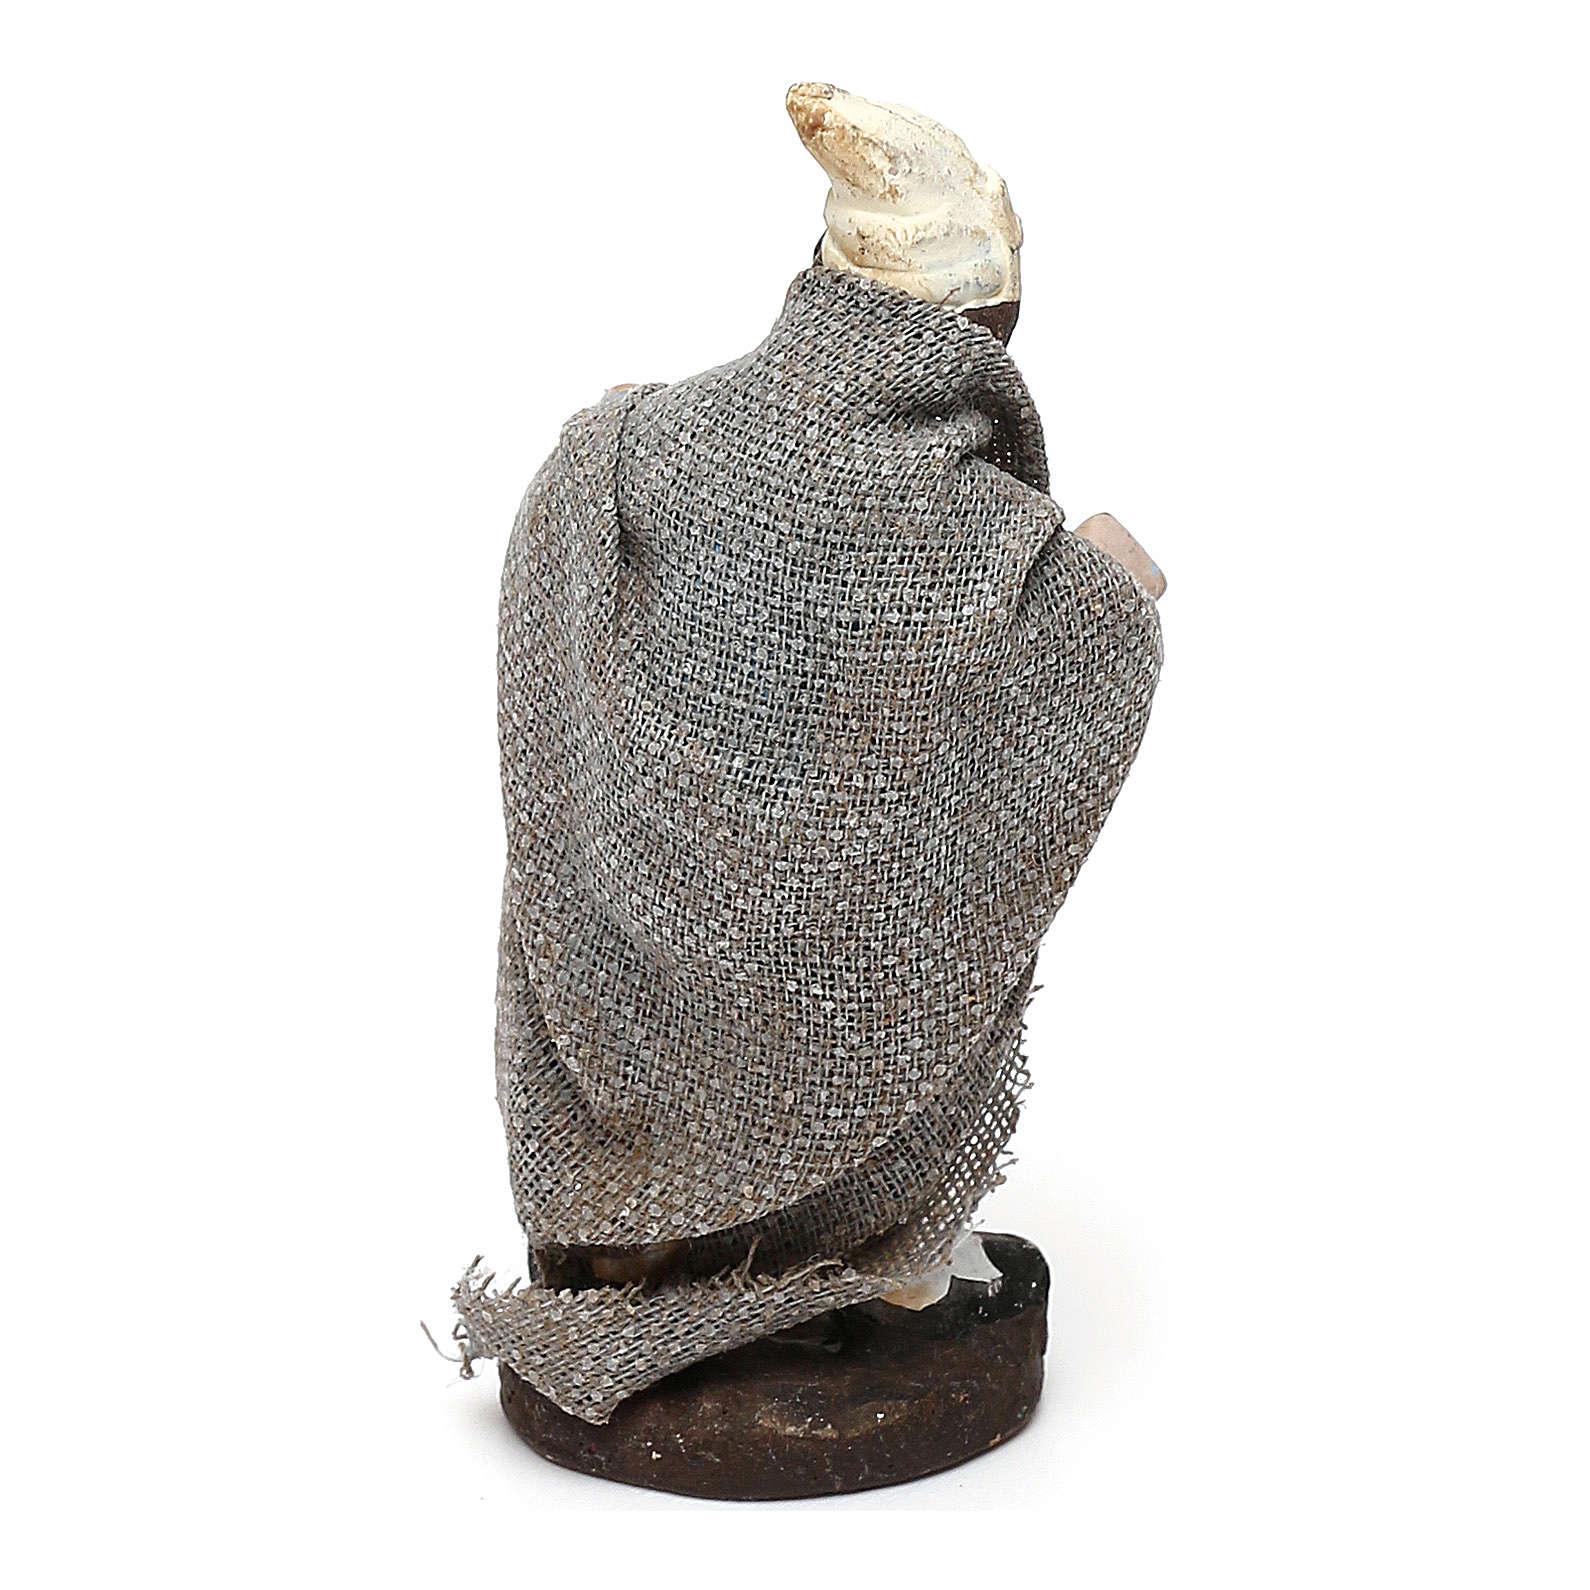 STOCK Pastor de terracota vestido 4 cm para belén Nápoles 4